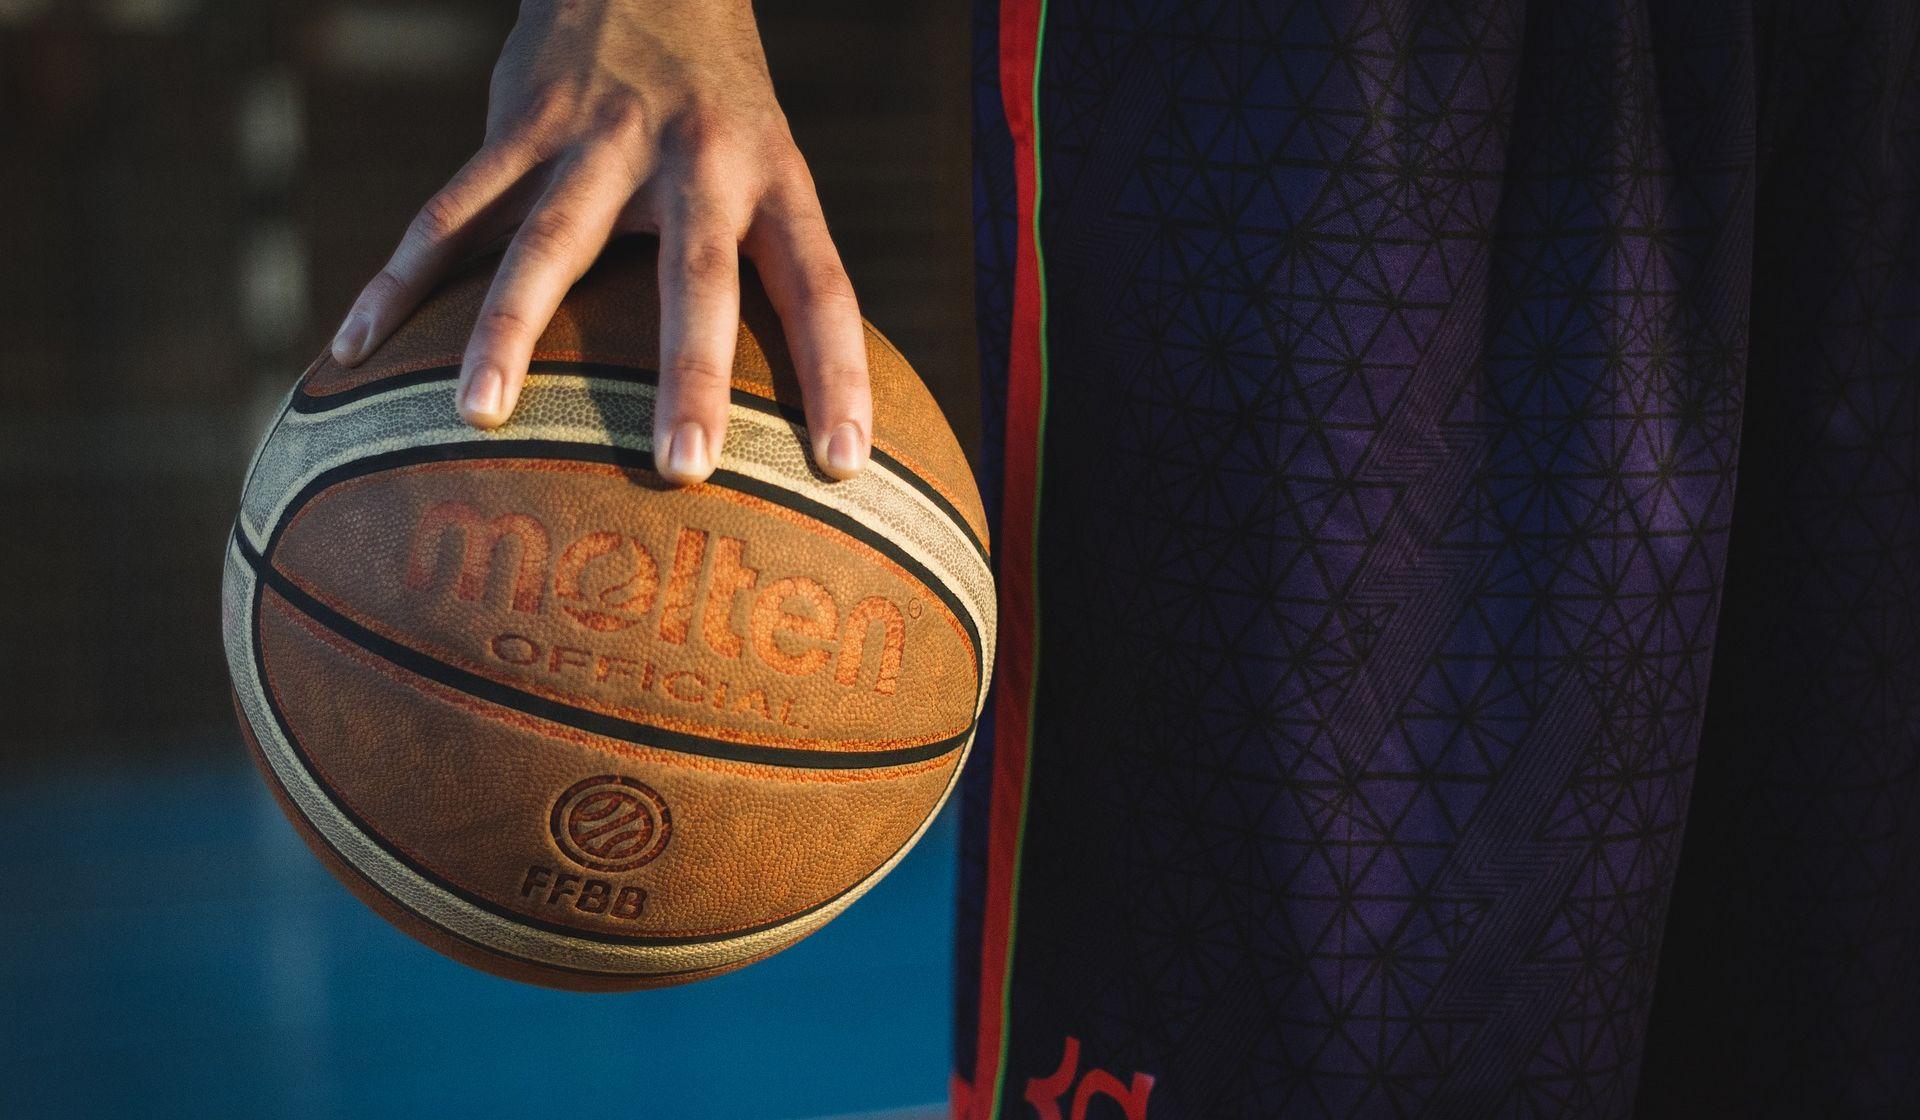 Sedam privedenih zbog upada na parket na košarkaškoj utakmici Šibenik-Zadar